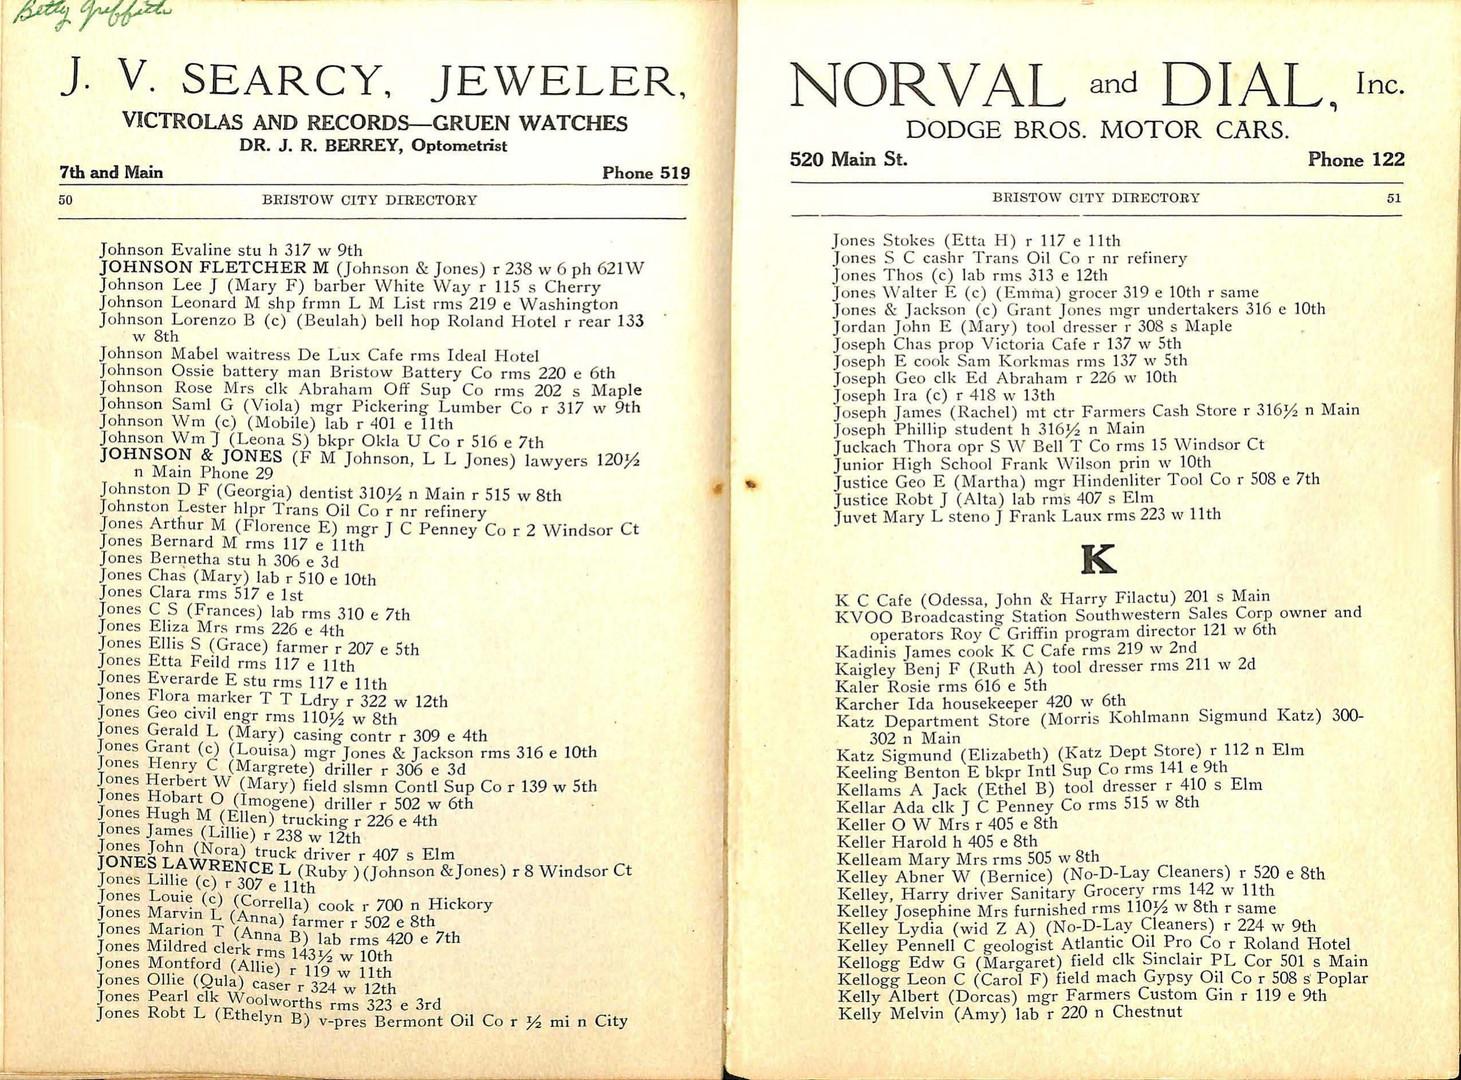 Bristow City Directory 1926_027.jpg